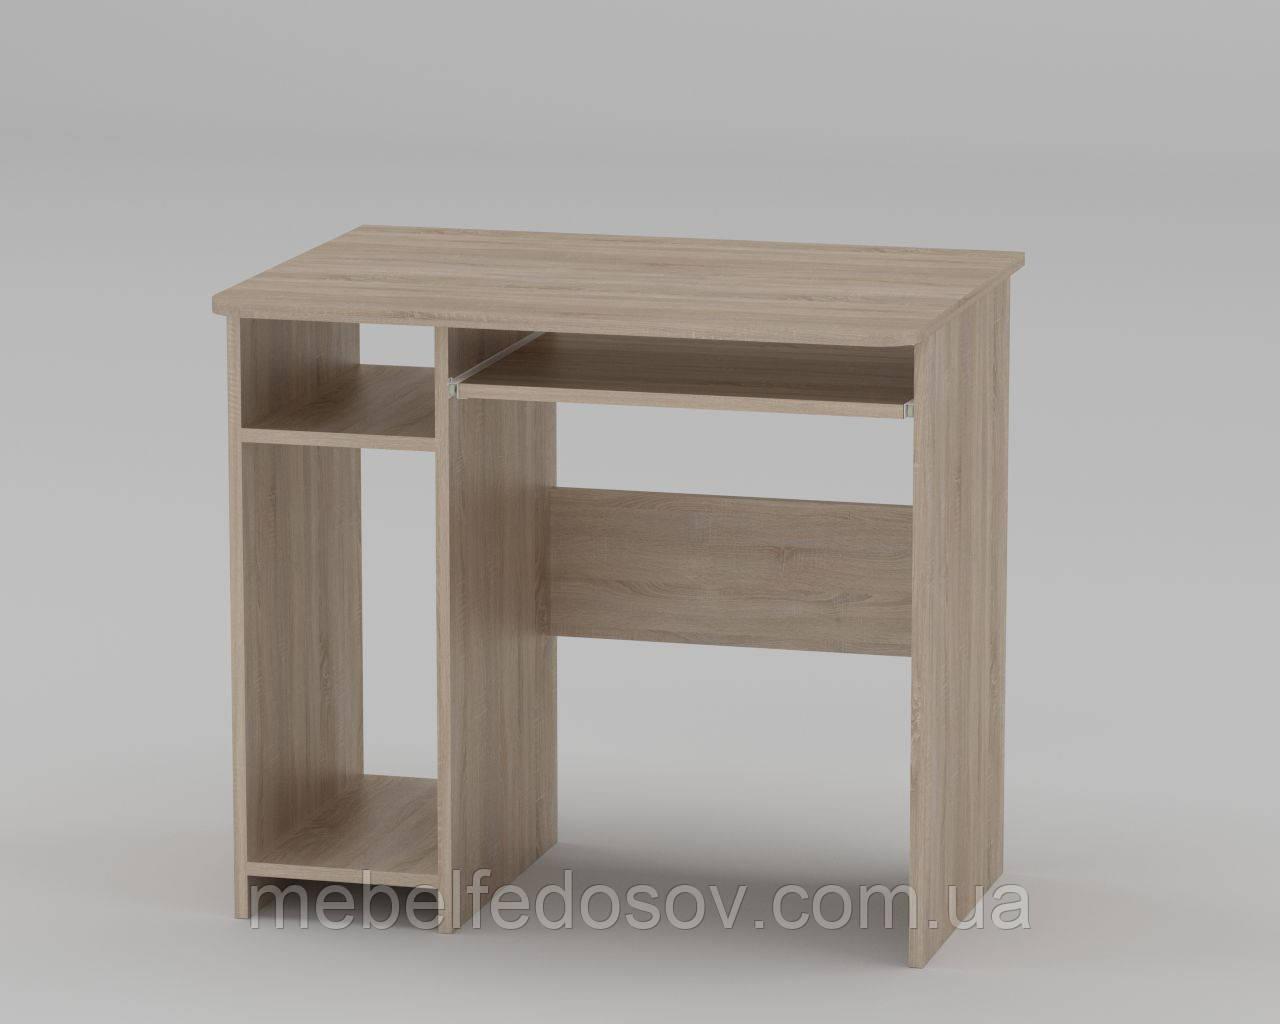 Стол компьютерный СКМ-12 (Компанит) 820х600х736мм